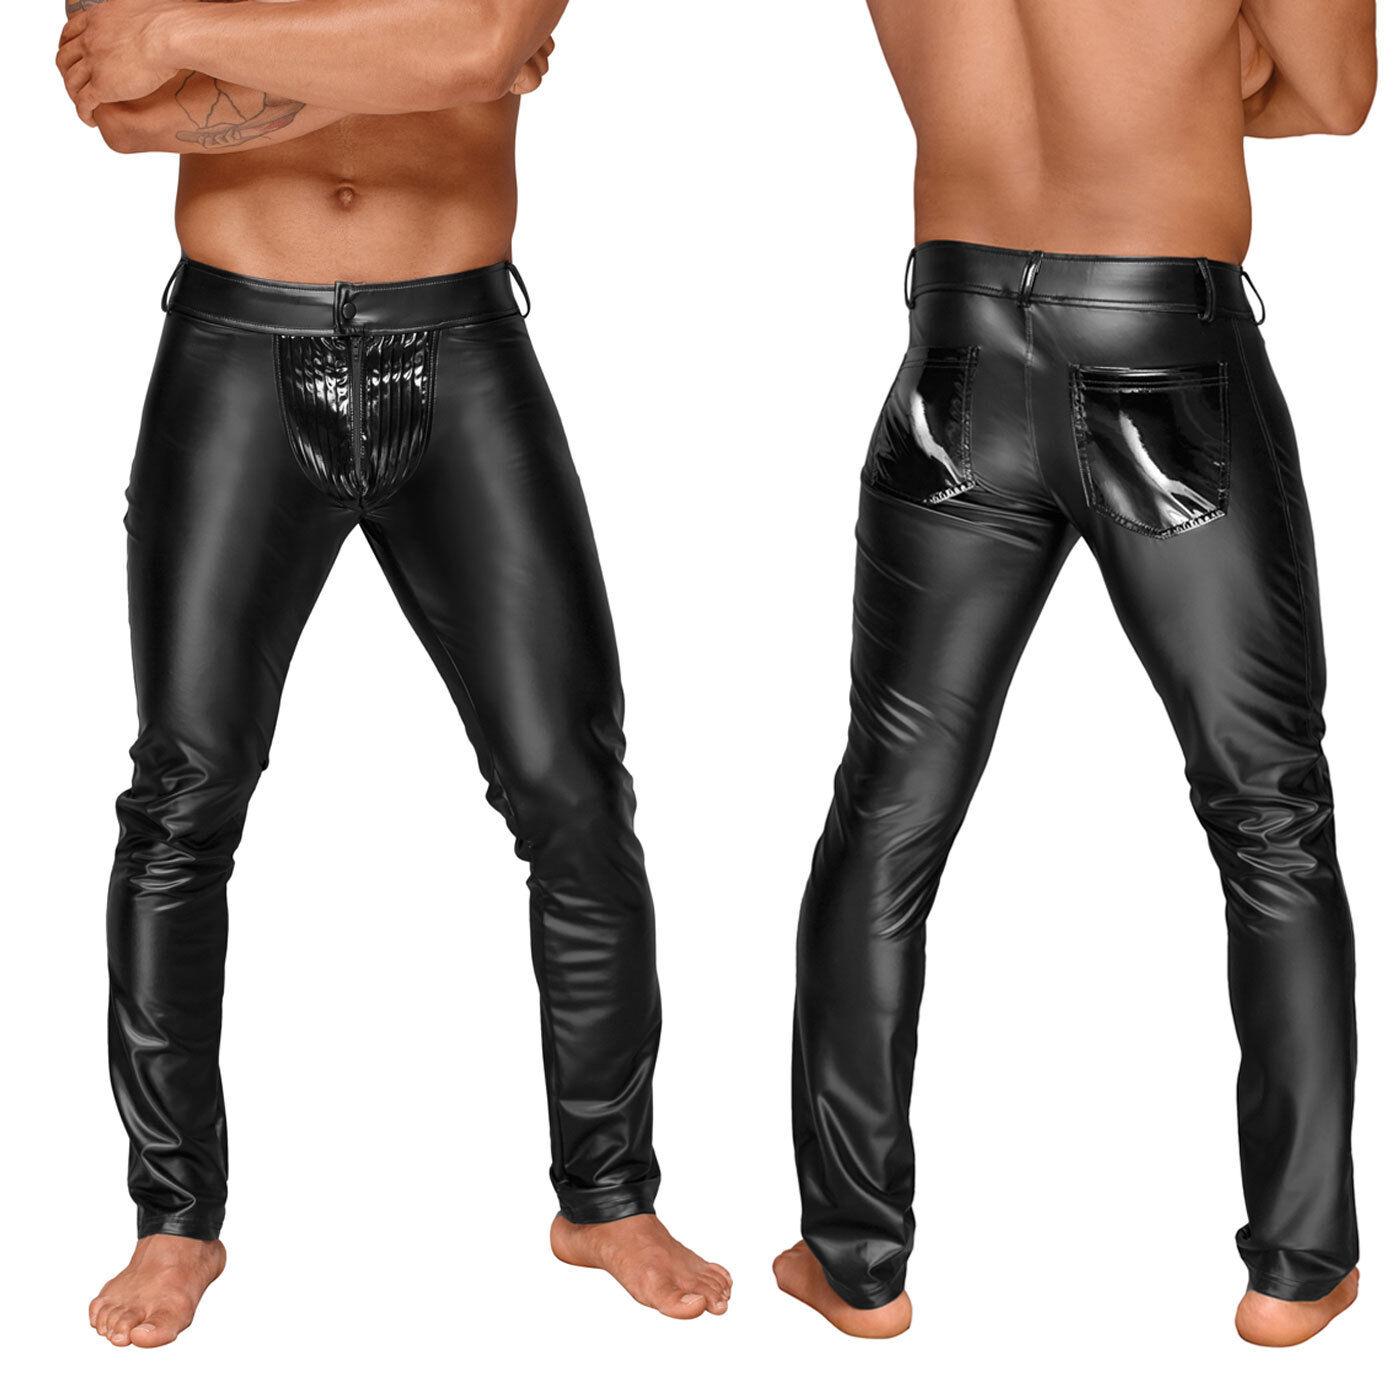 schwarz HANDMADE Power-Wetlook Herren-Hose mit Lack Cod-Piece Clubwear Vinyl Pants